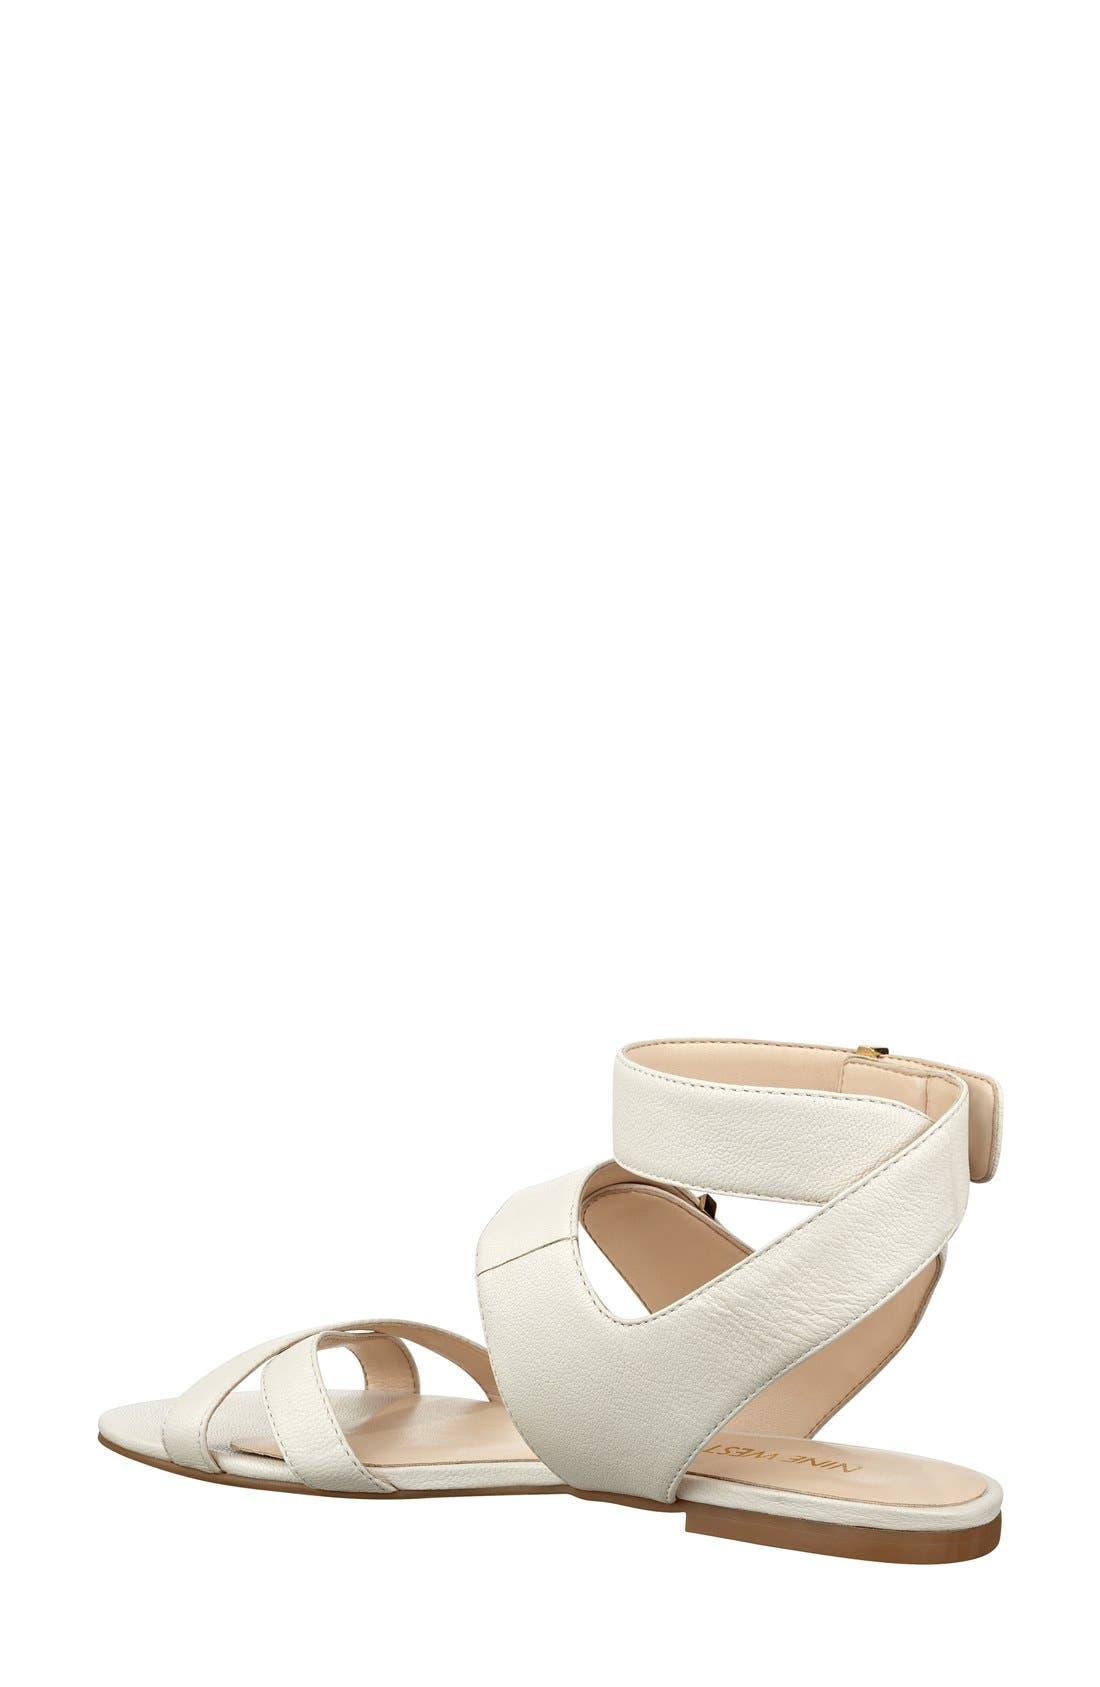 Alternate Image 2  - Nine West 'Darcelle' Flat Sandal (Women)